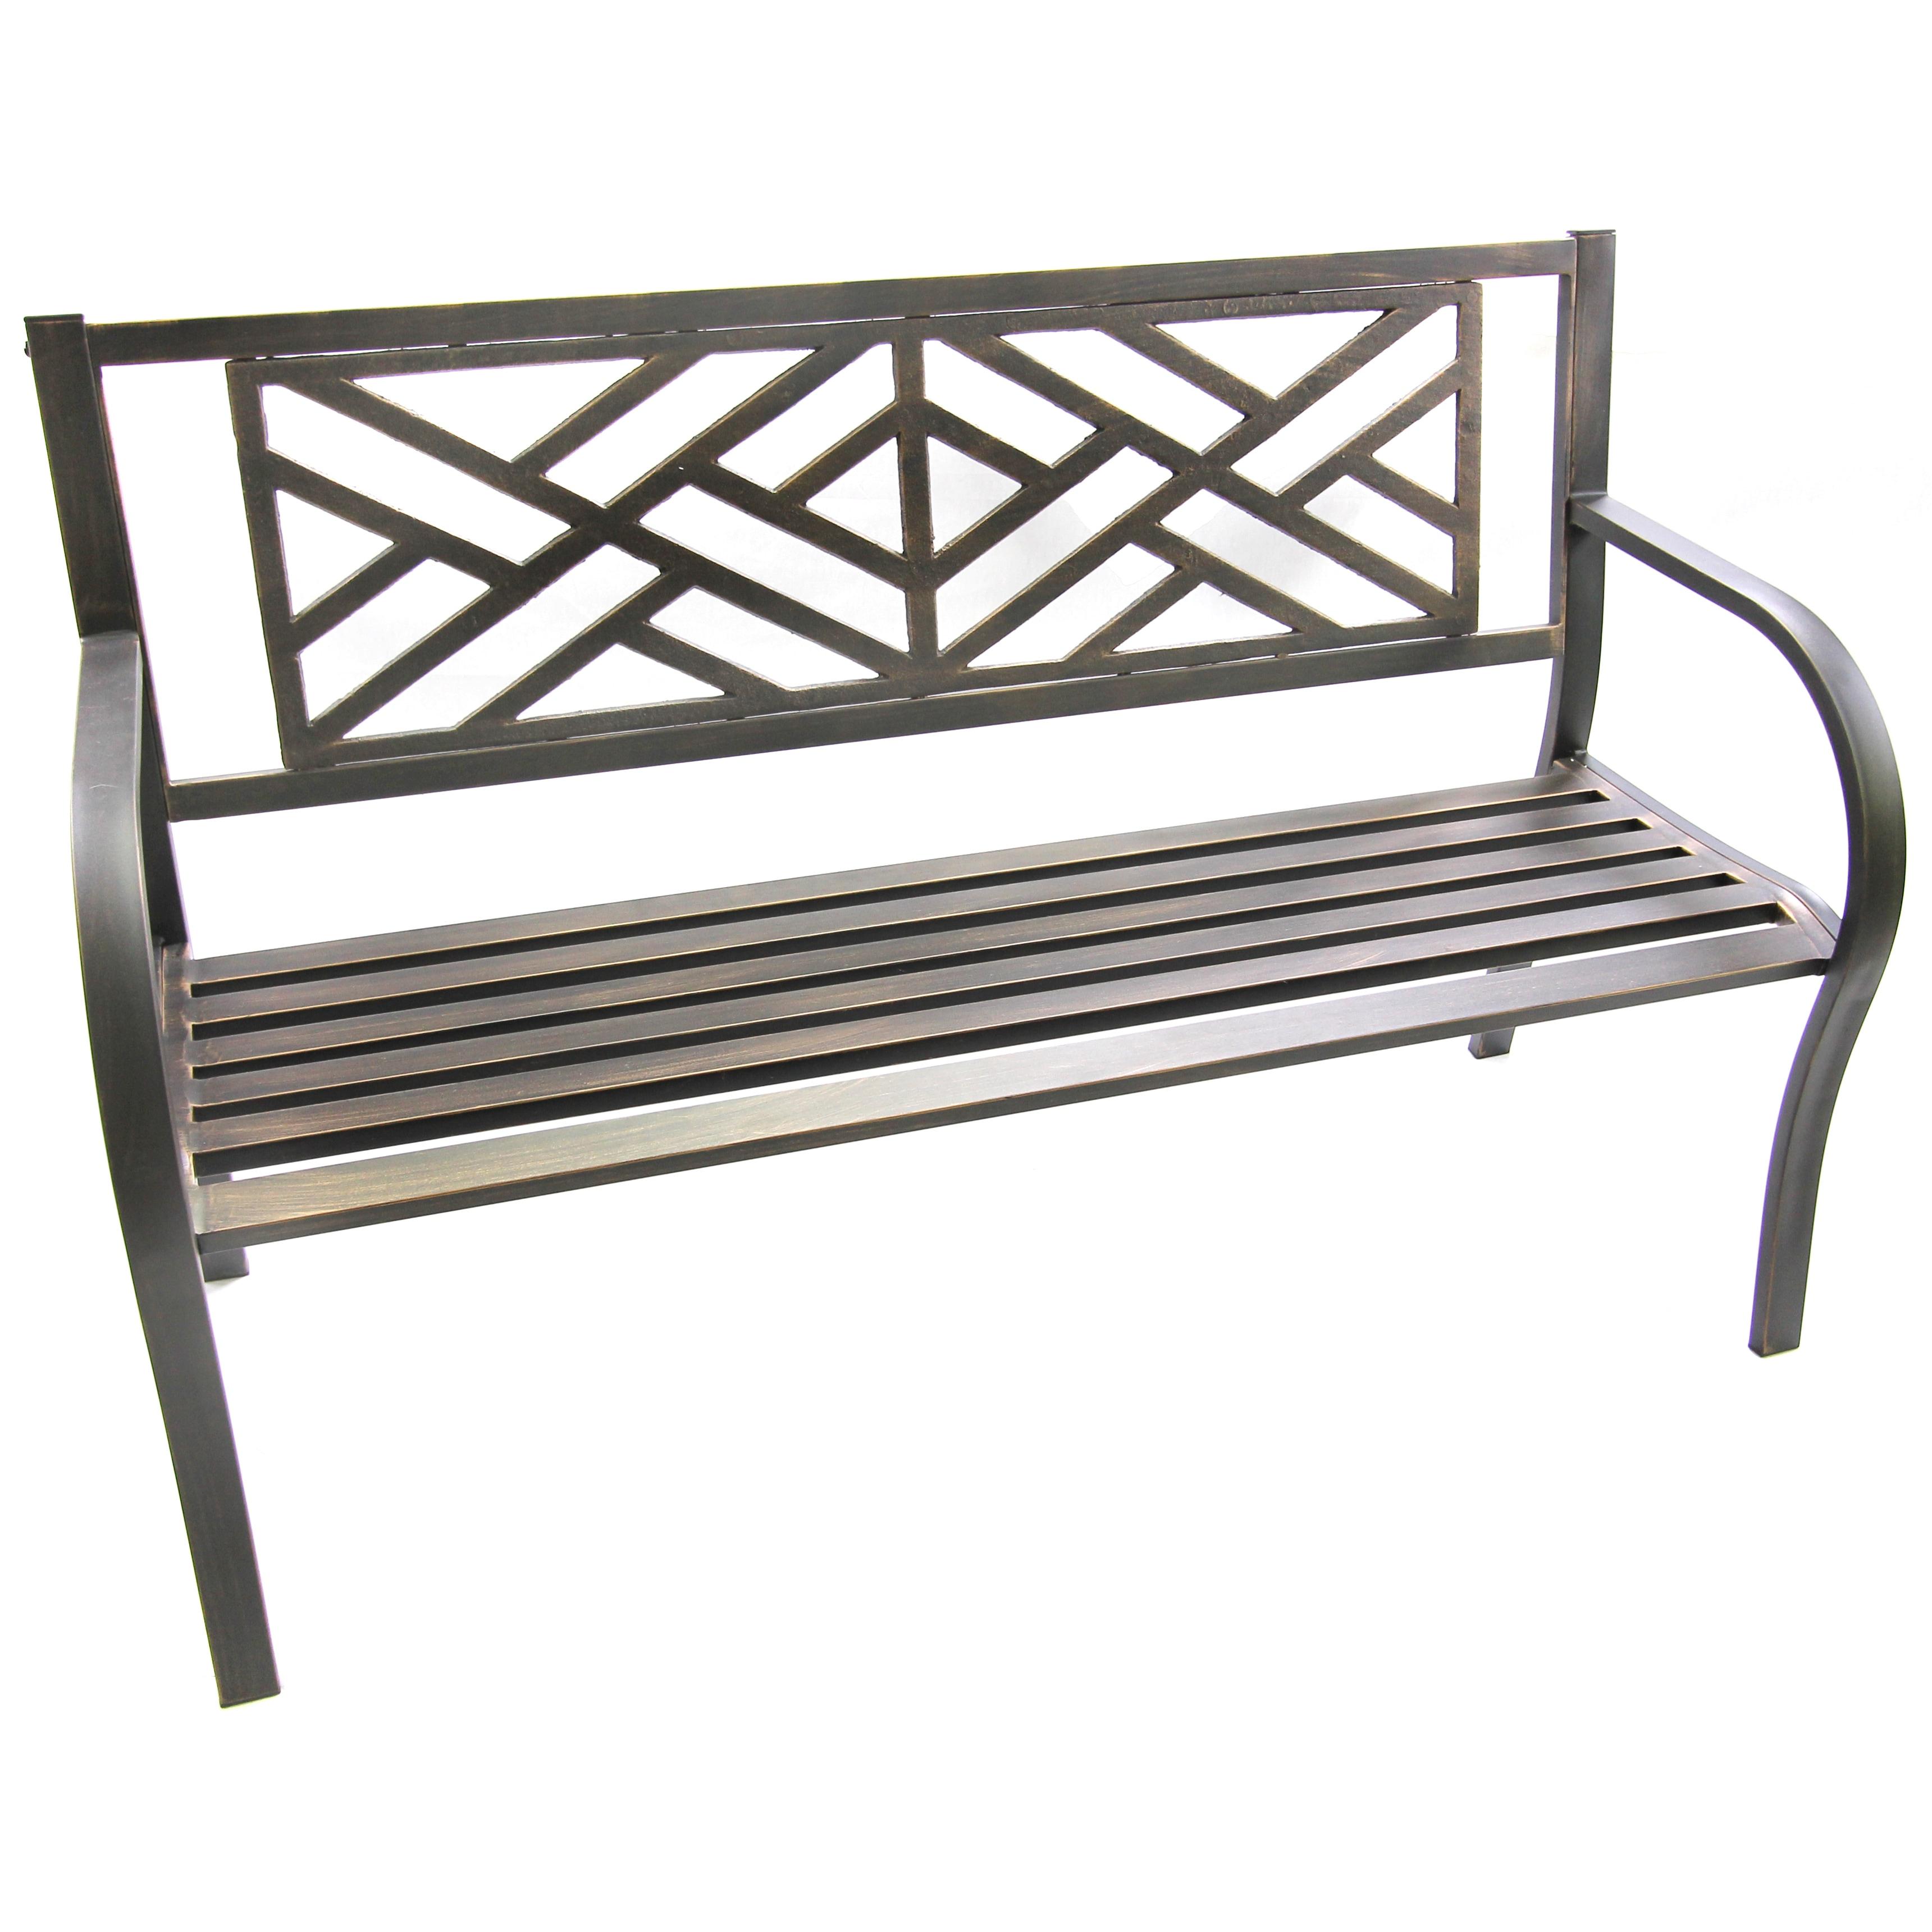 Jordan Maze Bench (Black Maze Bench), Patio Furniture (St...